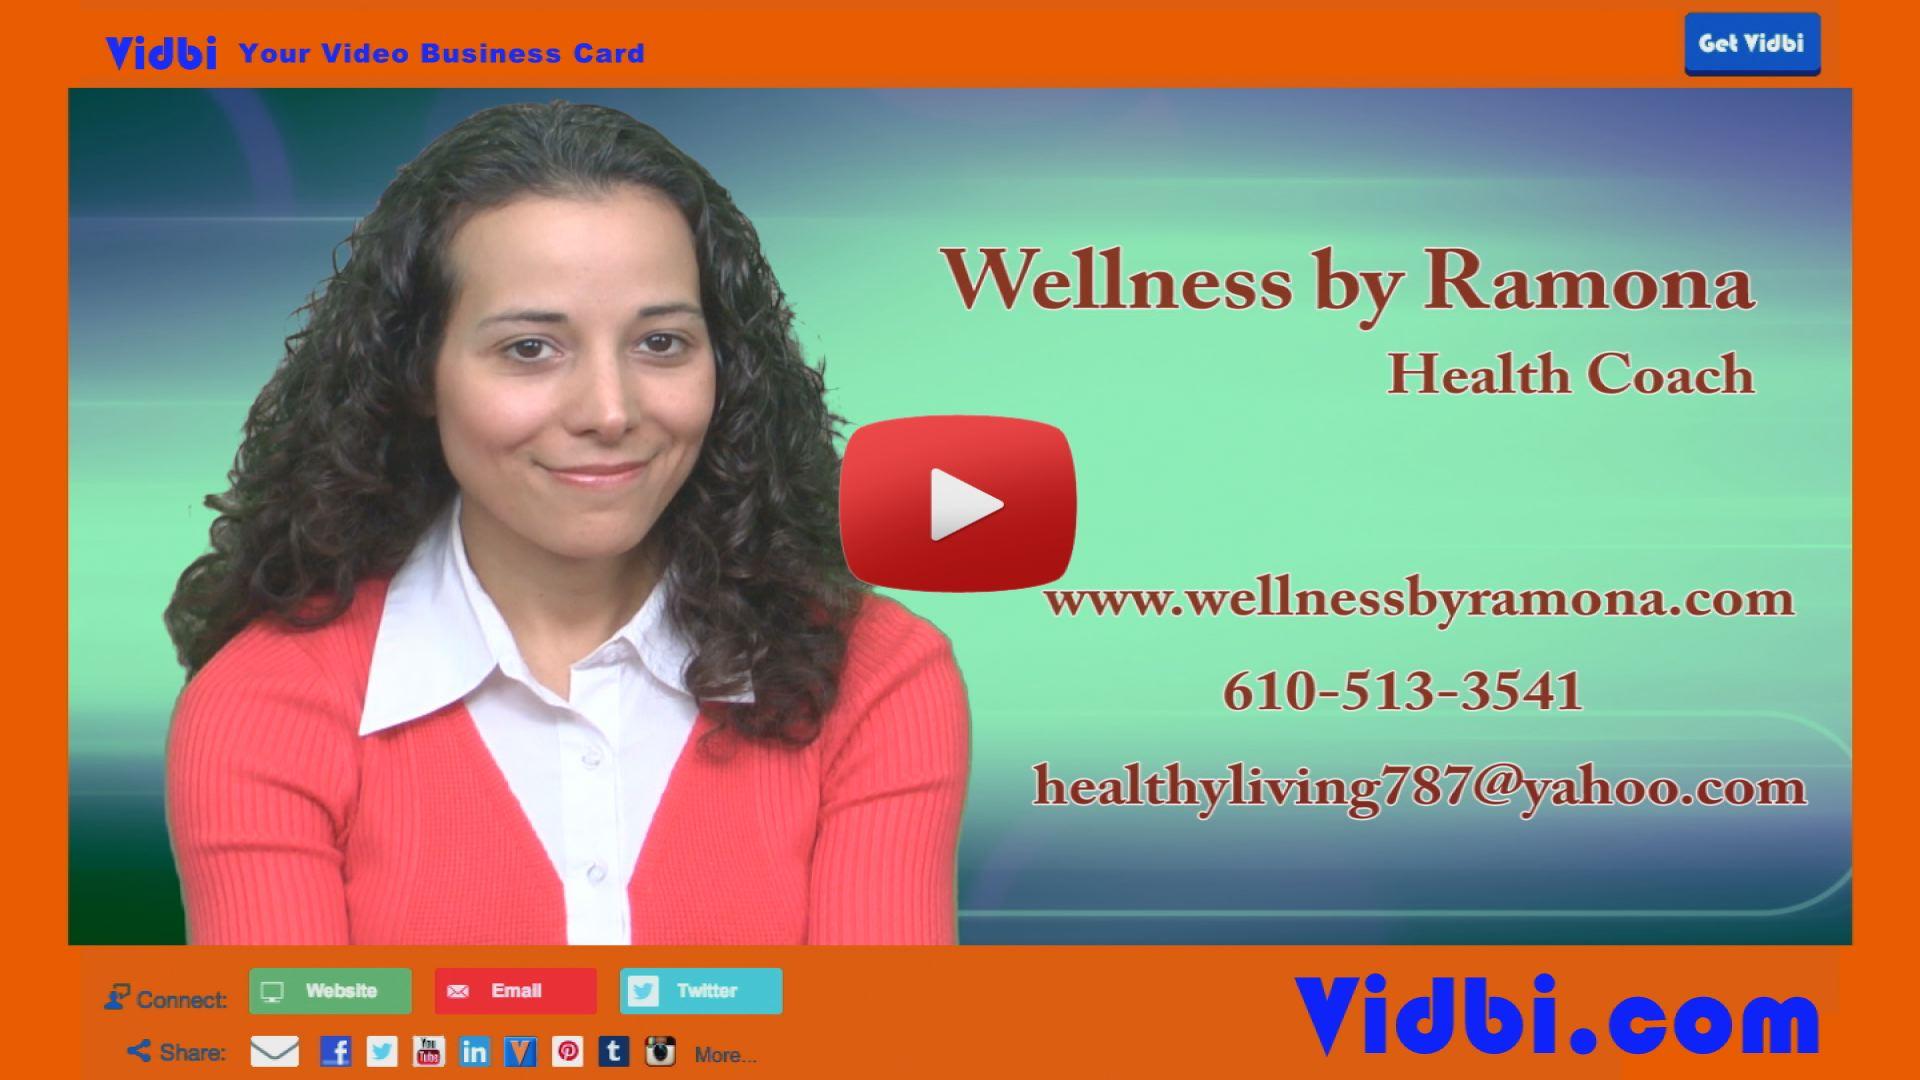 Ramona Fasula - Wellness by Ramona Vidbi